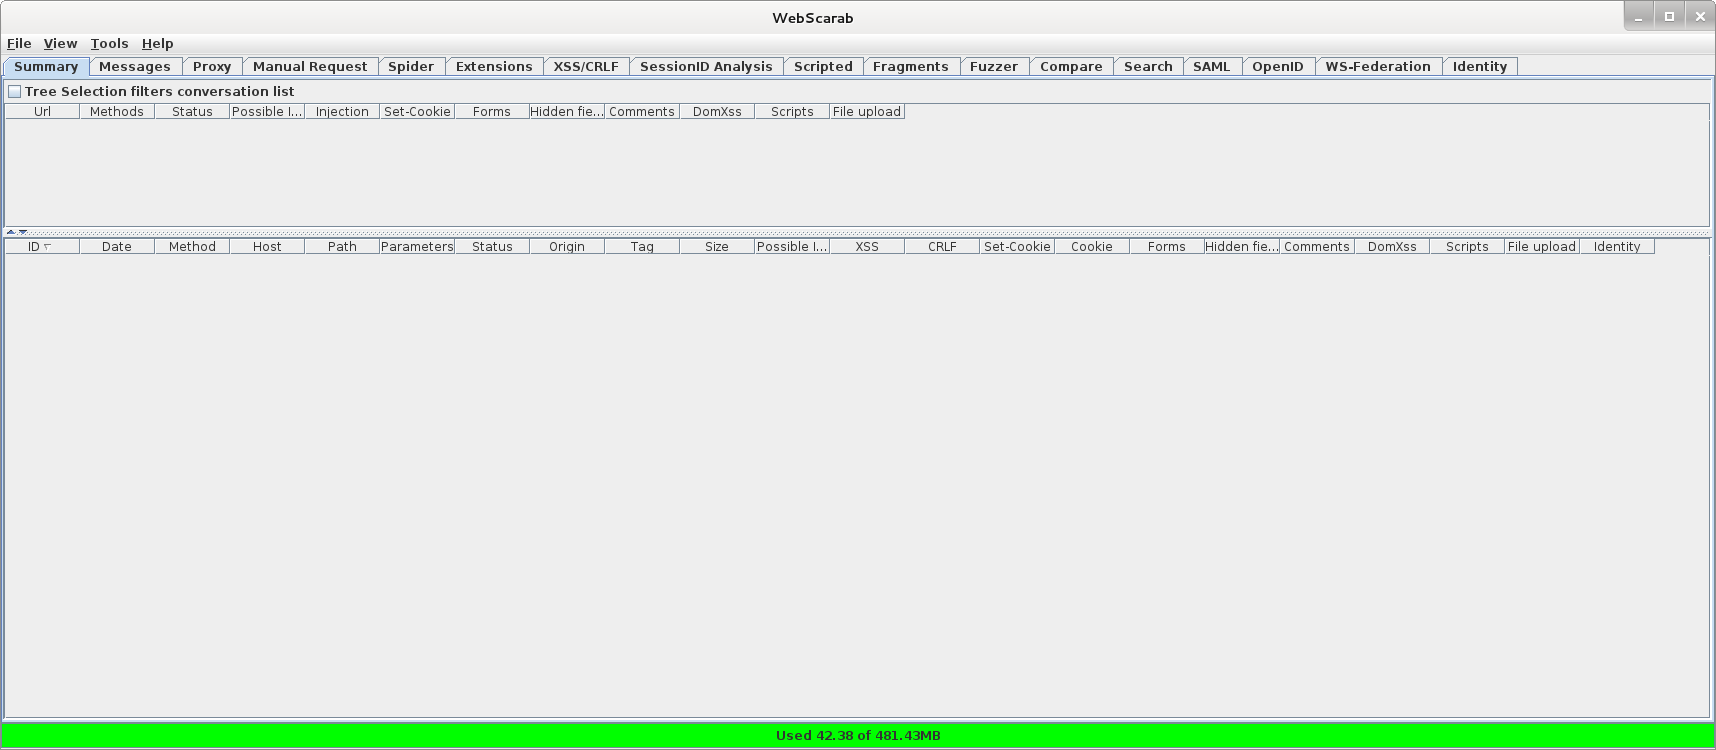 Купить Прокси Яндекс Рабочие Прокси Франция Под Чекер Crossfire- Свежие Прокси. Купить Прокси Рабочие Для Аддурилки Яндекс